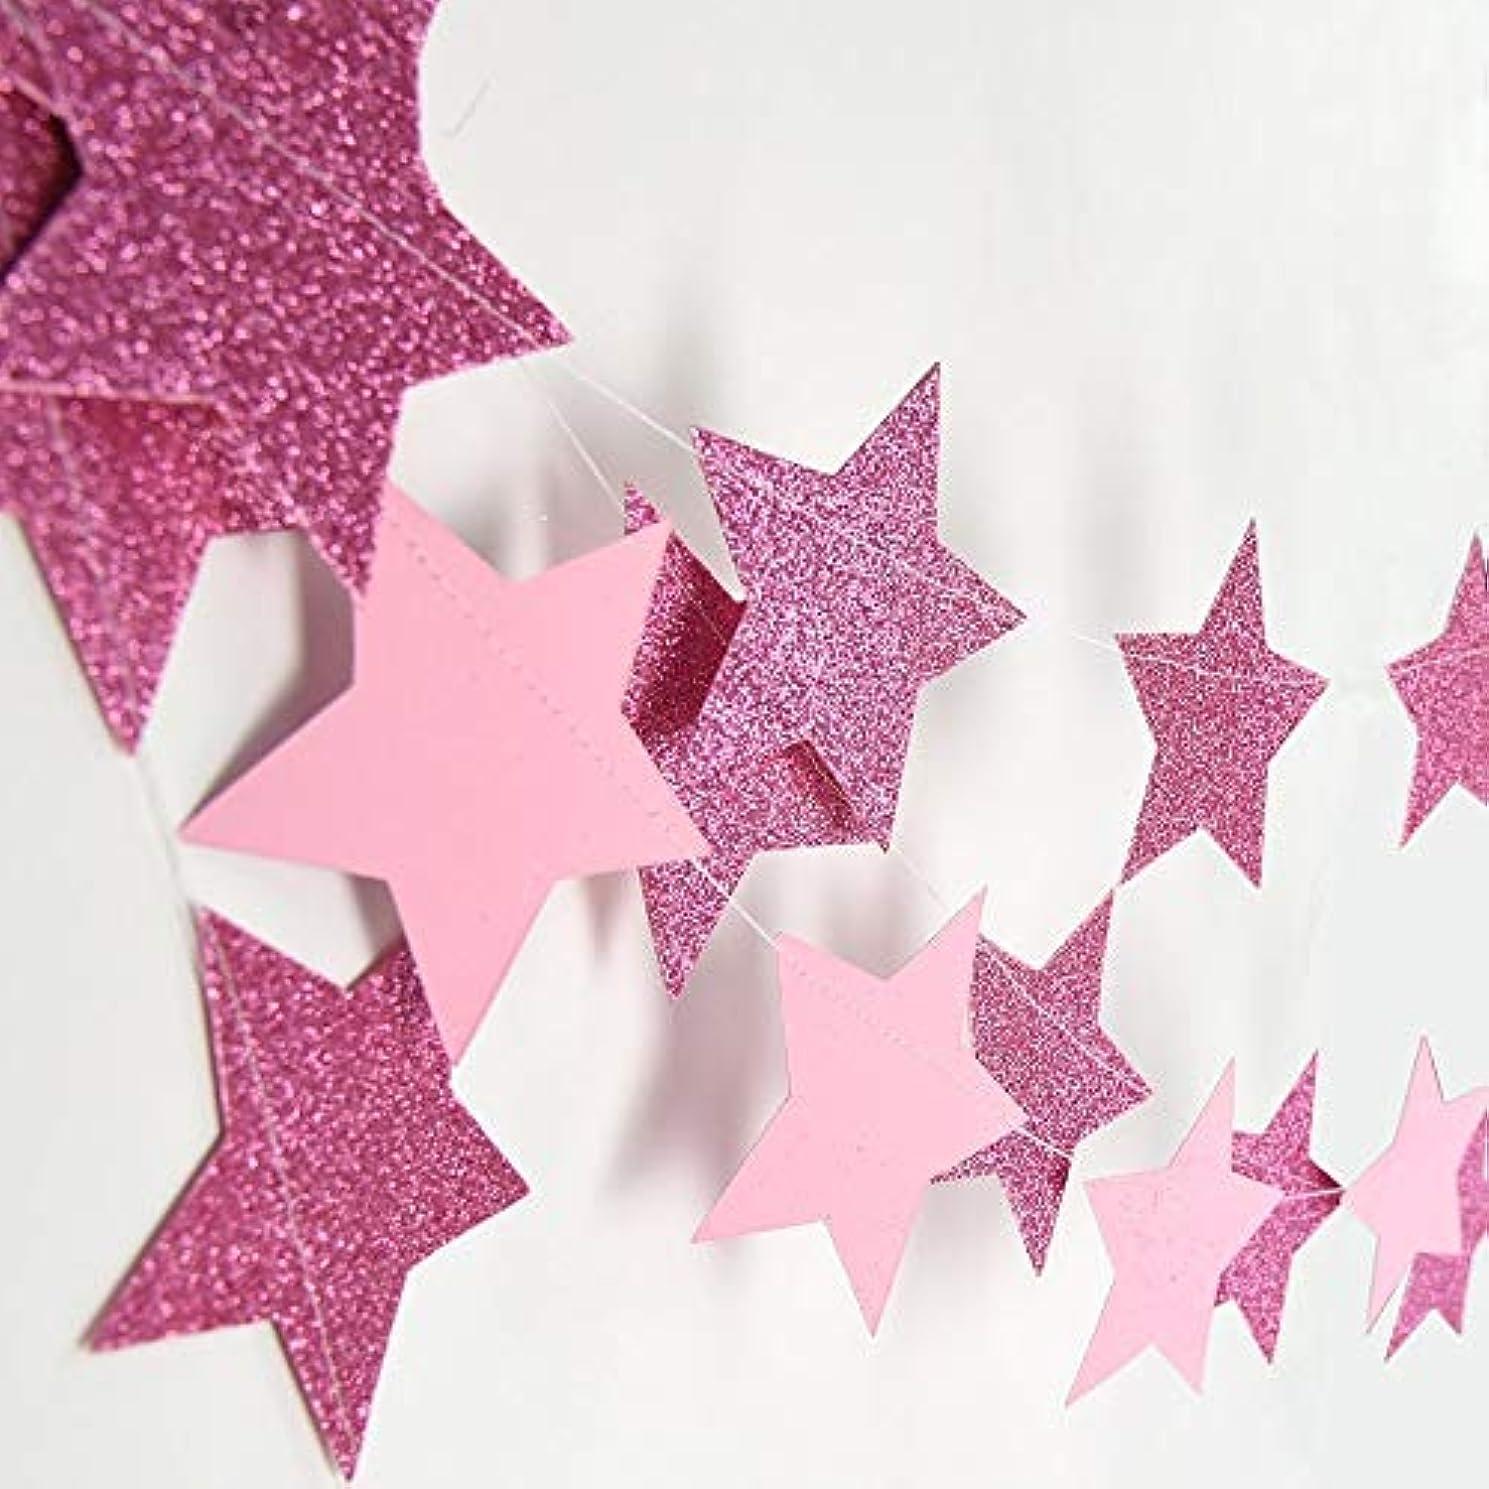 Skoye 2-Pack,Pink Star Garland, Pink Christmas Galaxy Banner, Twinkle Twinkle Little Star Garland Christmas Garland, Christmas Decor, Pink Baby Shower (Pink)